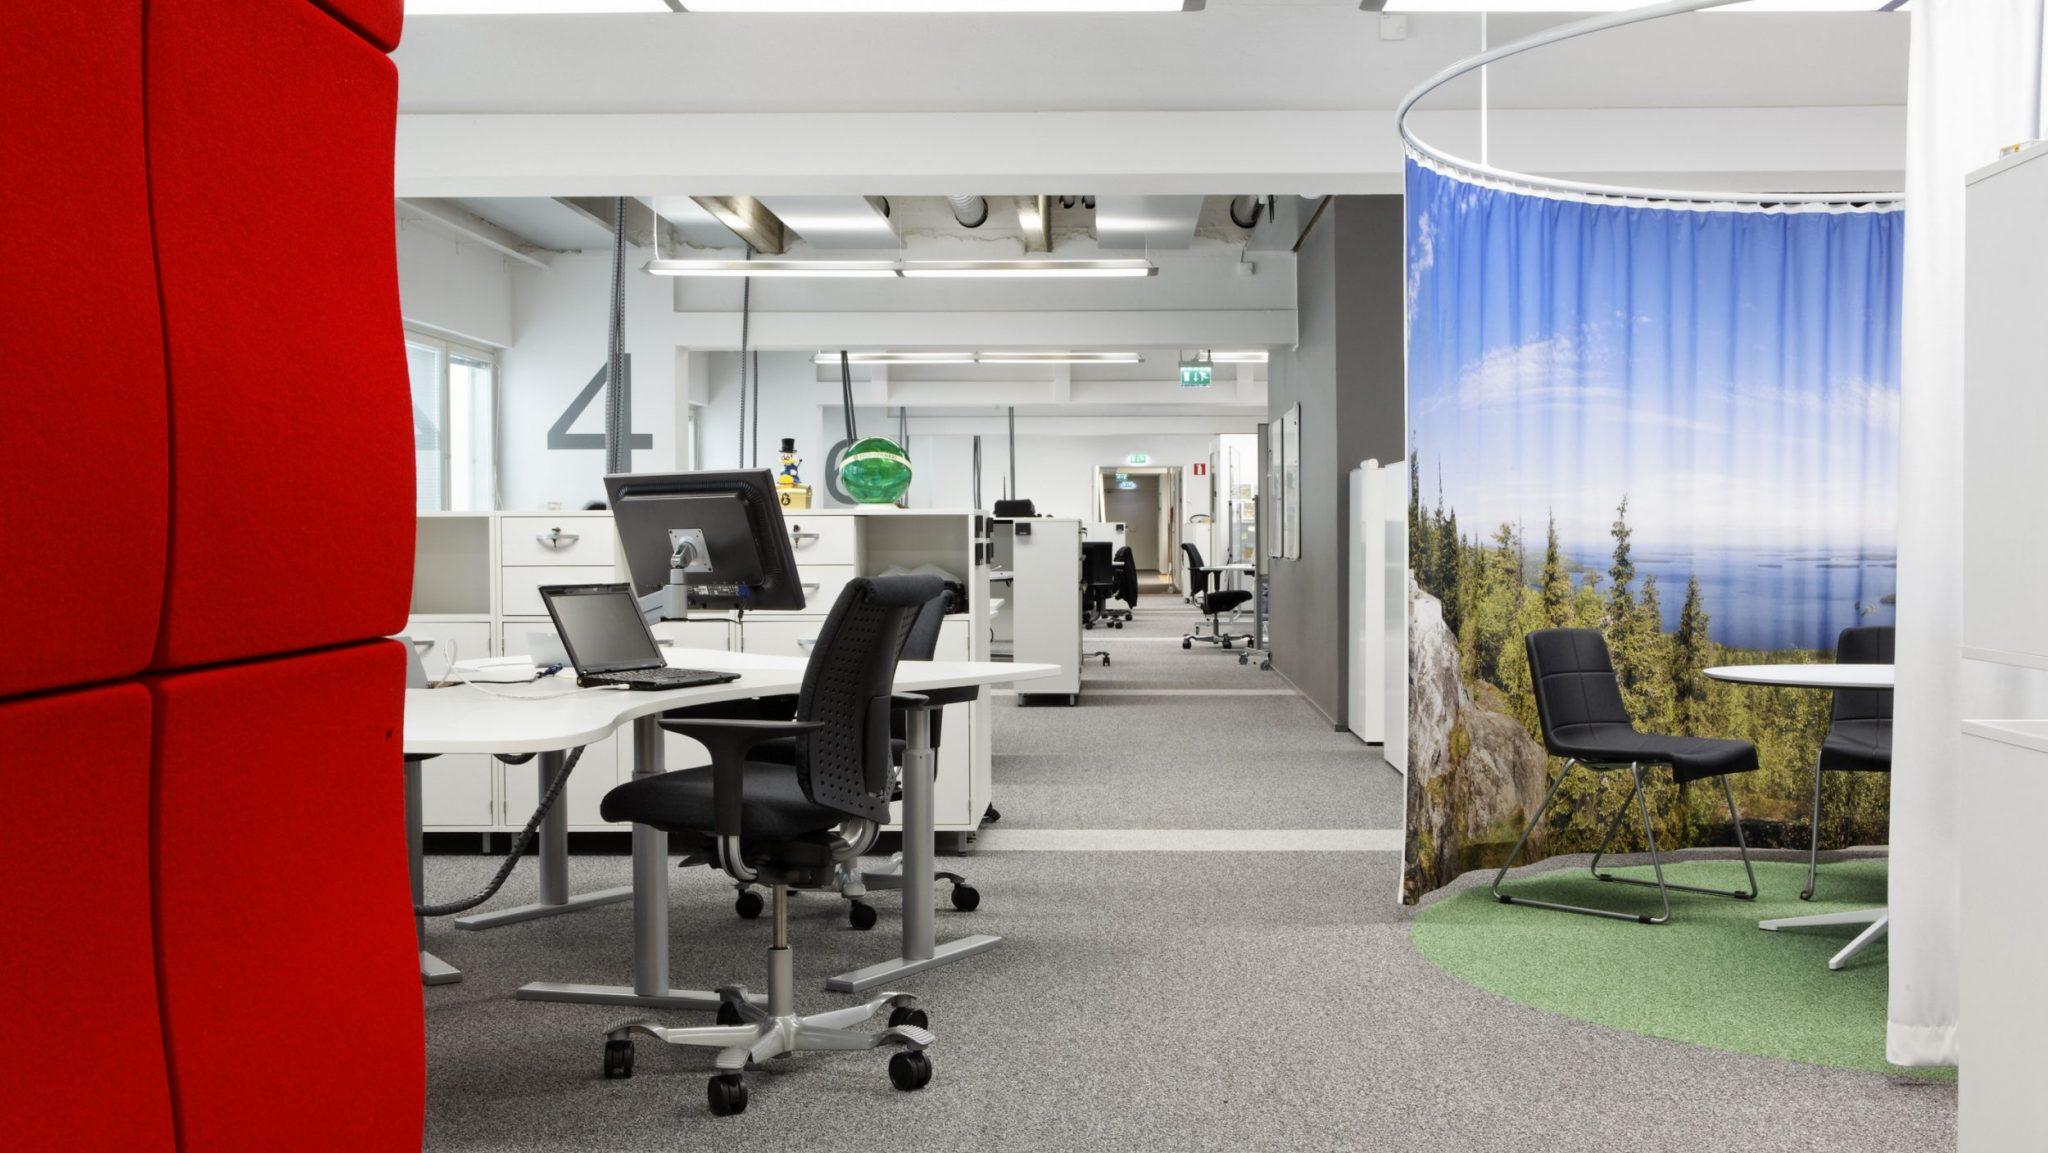 Nordea-Bank-Finland-GI-Project-3